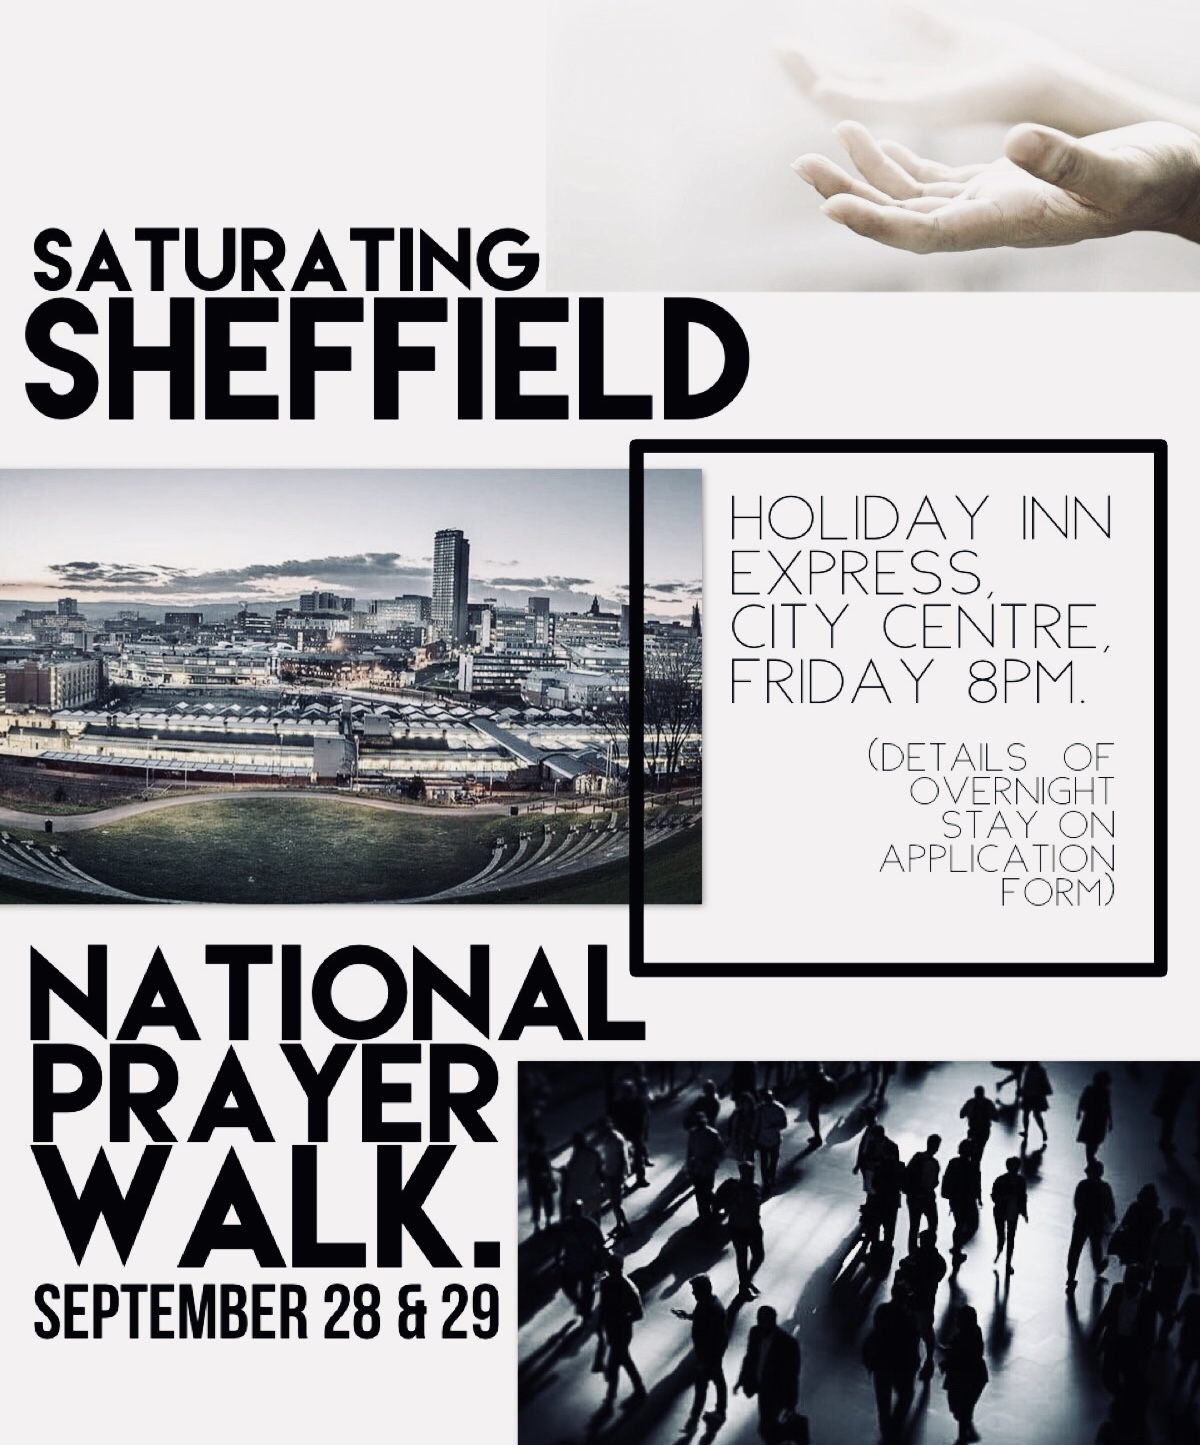 National Prayer Walk 2018 - SATURATING SHEFFIELD